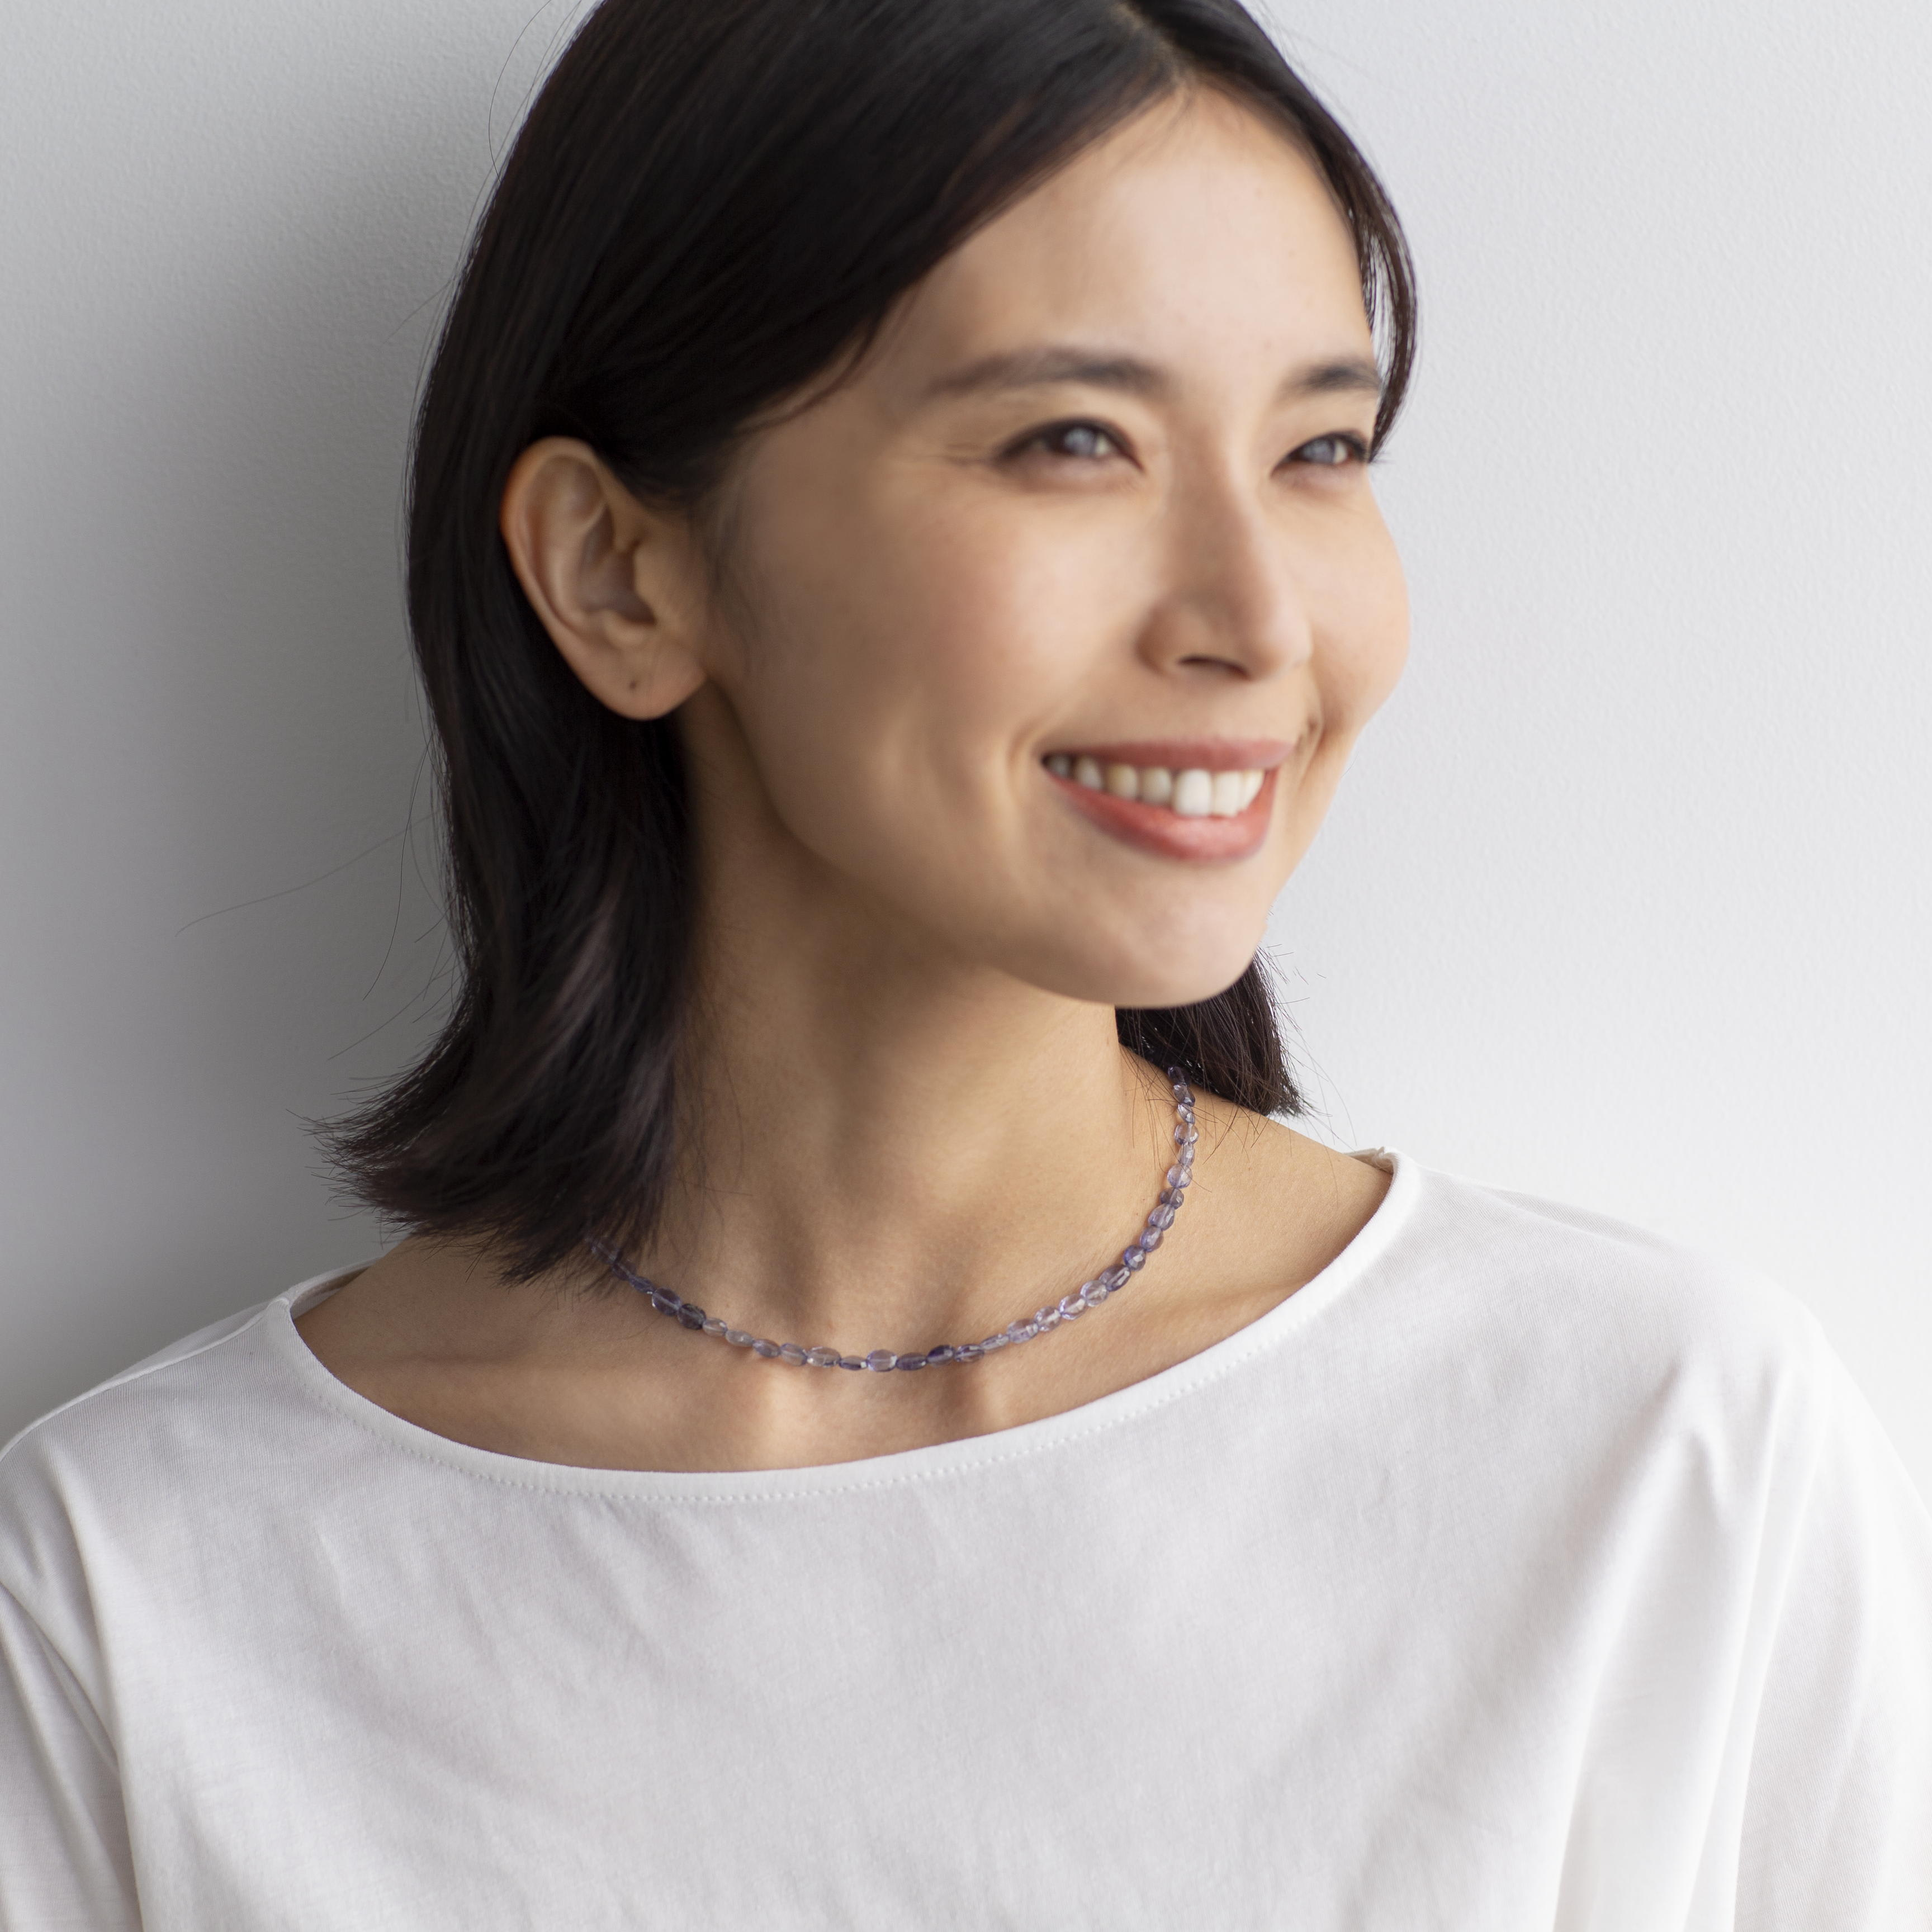 YUKIKO OKURA/ユキコ・オオクラ SV アイオライト ネックレス